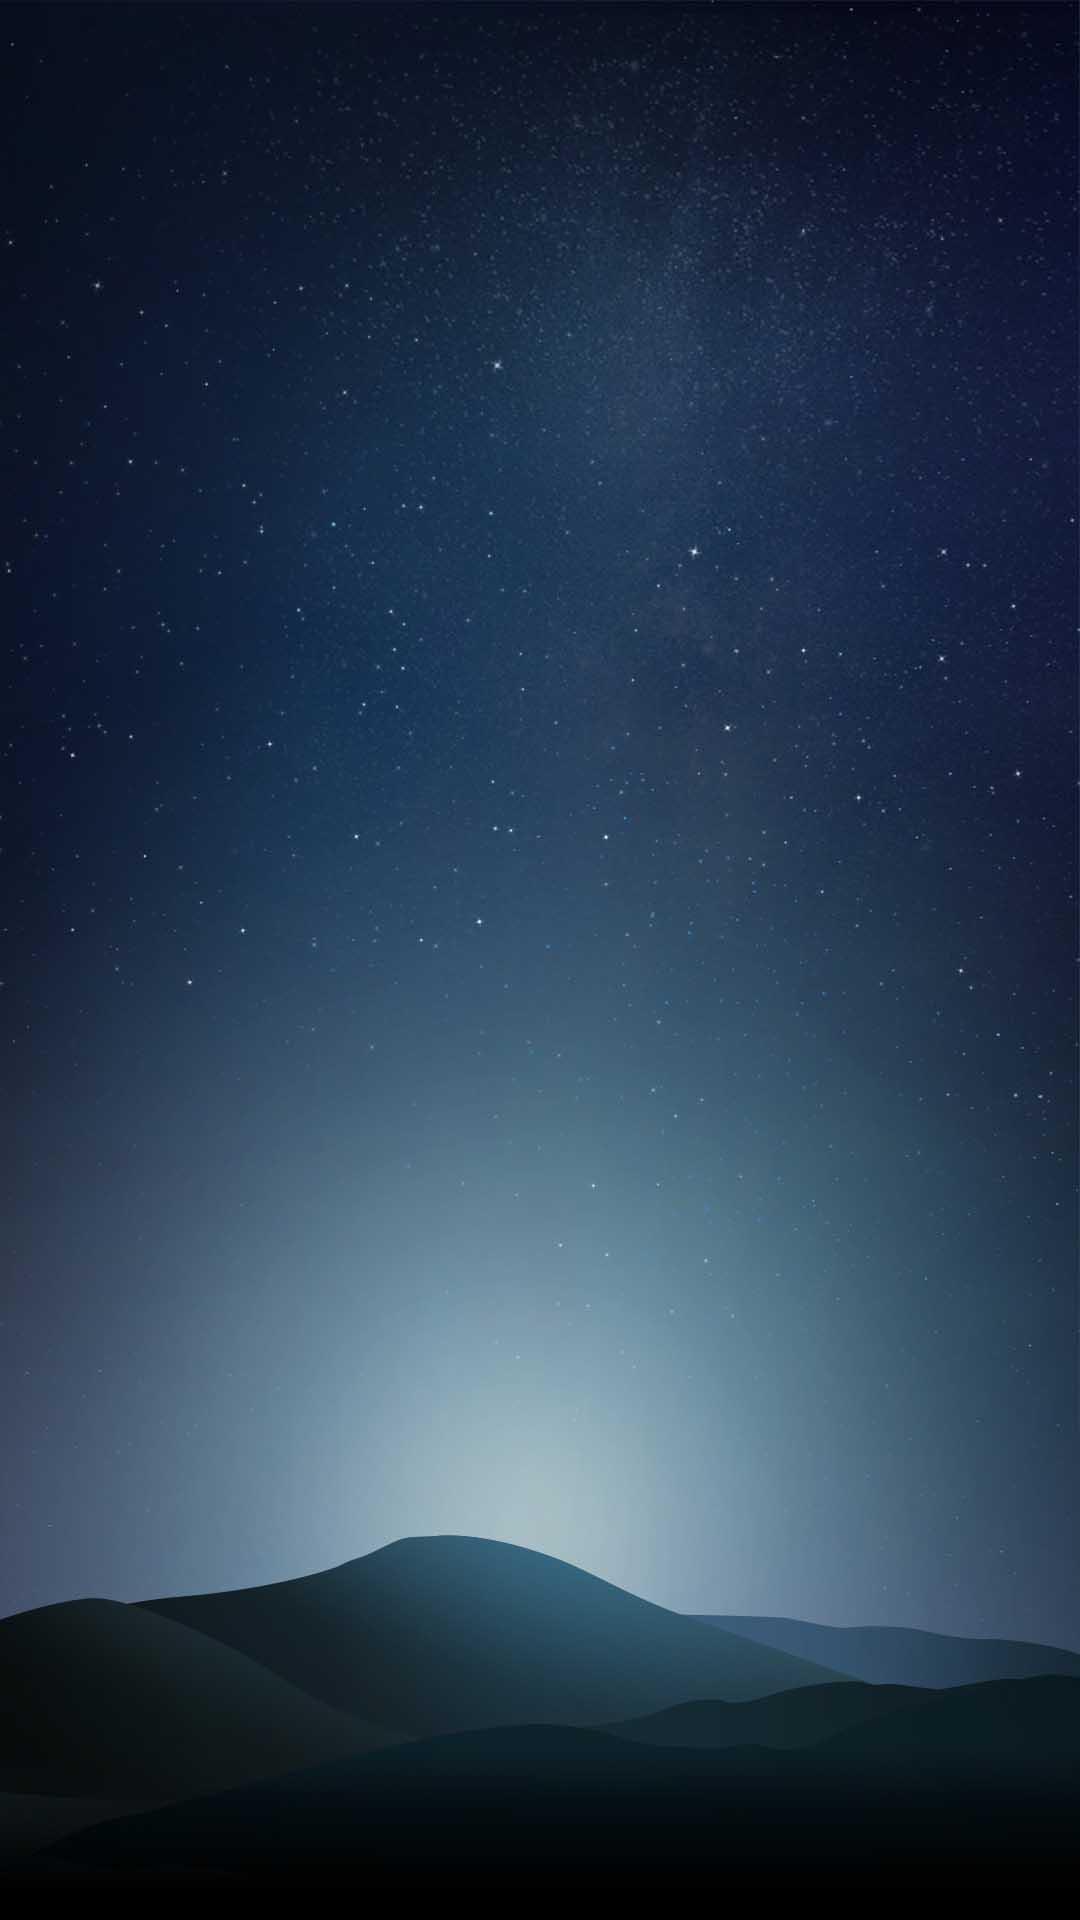 Iphone X Wallpaper Official Download Download Xiaomi Mi Note 3 Mi Mix 2 And Mi A1 Stock